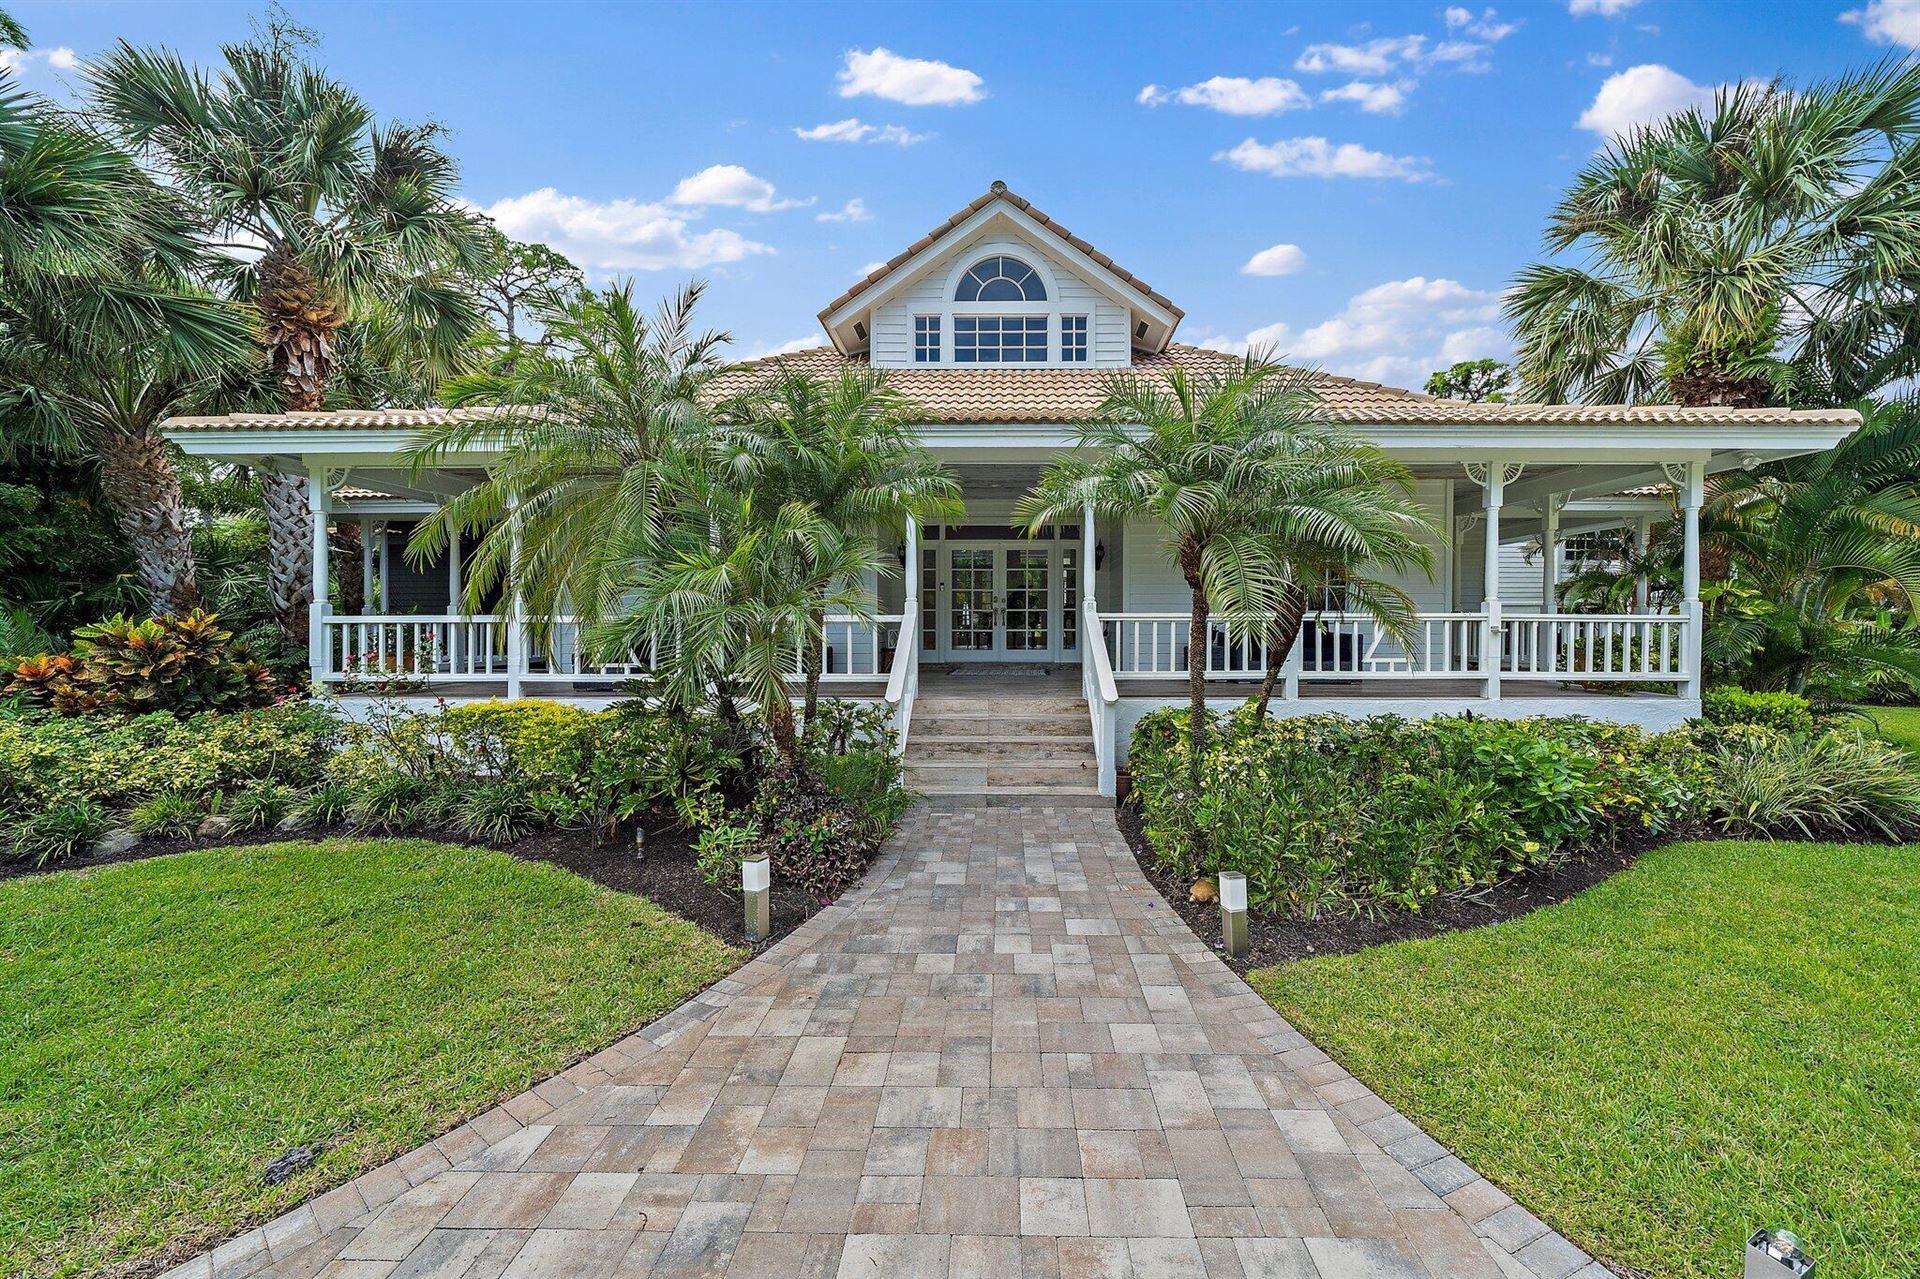 5901 190th Court N, Jupiter, FL 33458 - MLS#: RX-10750396